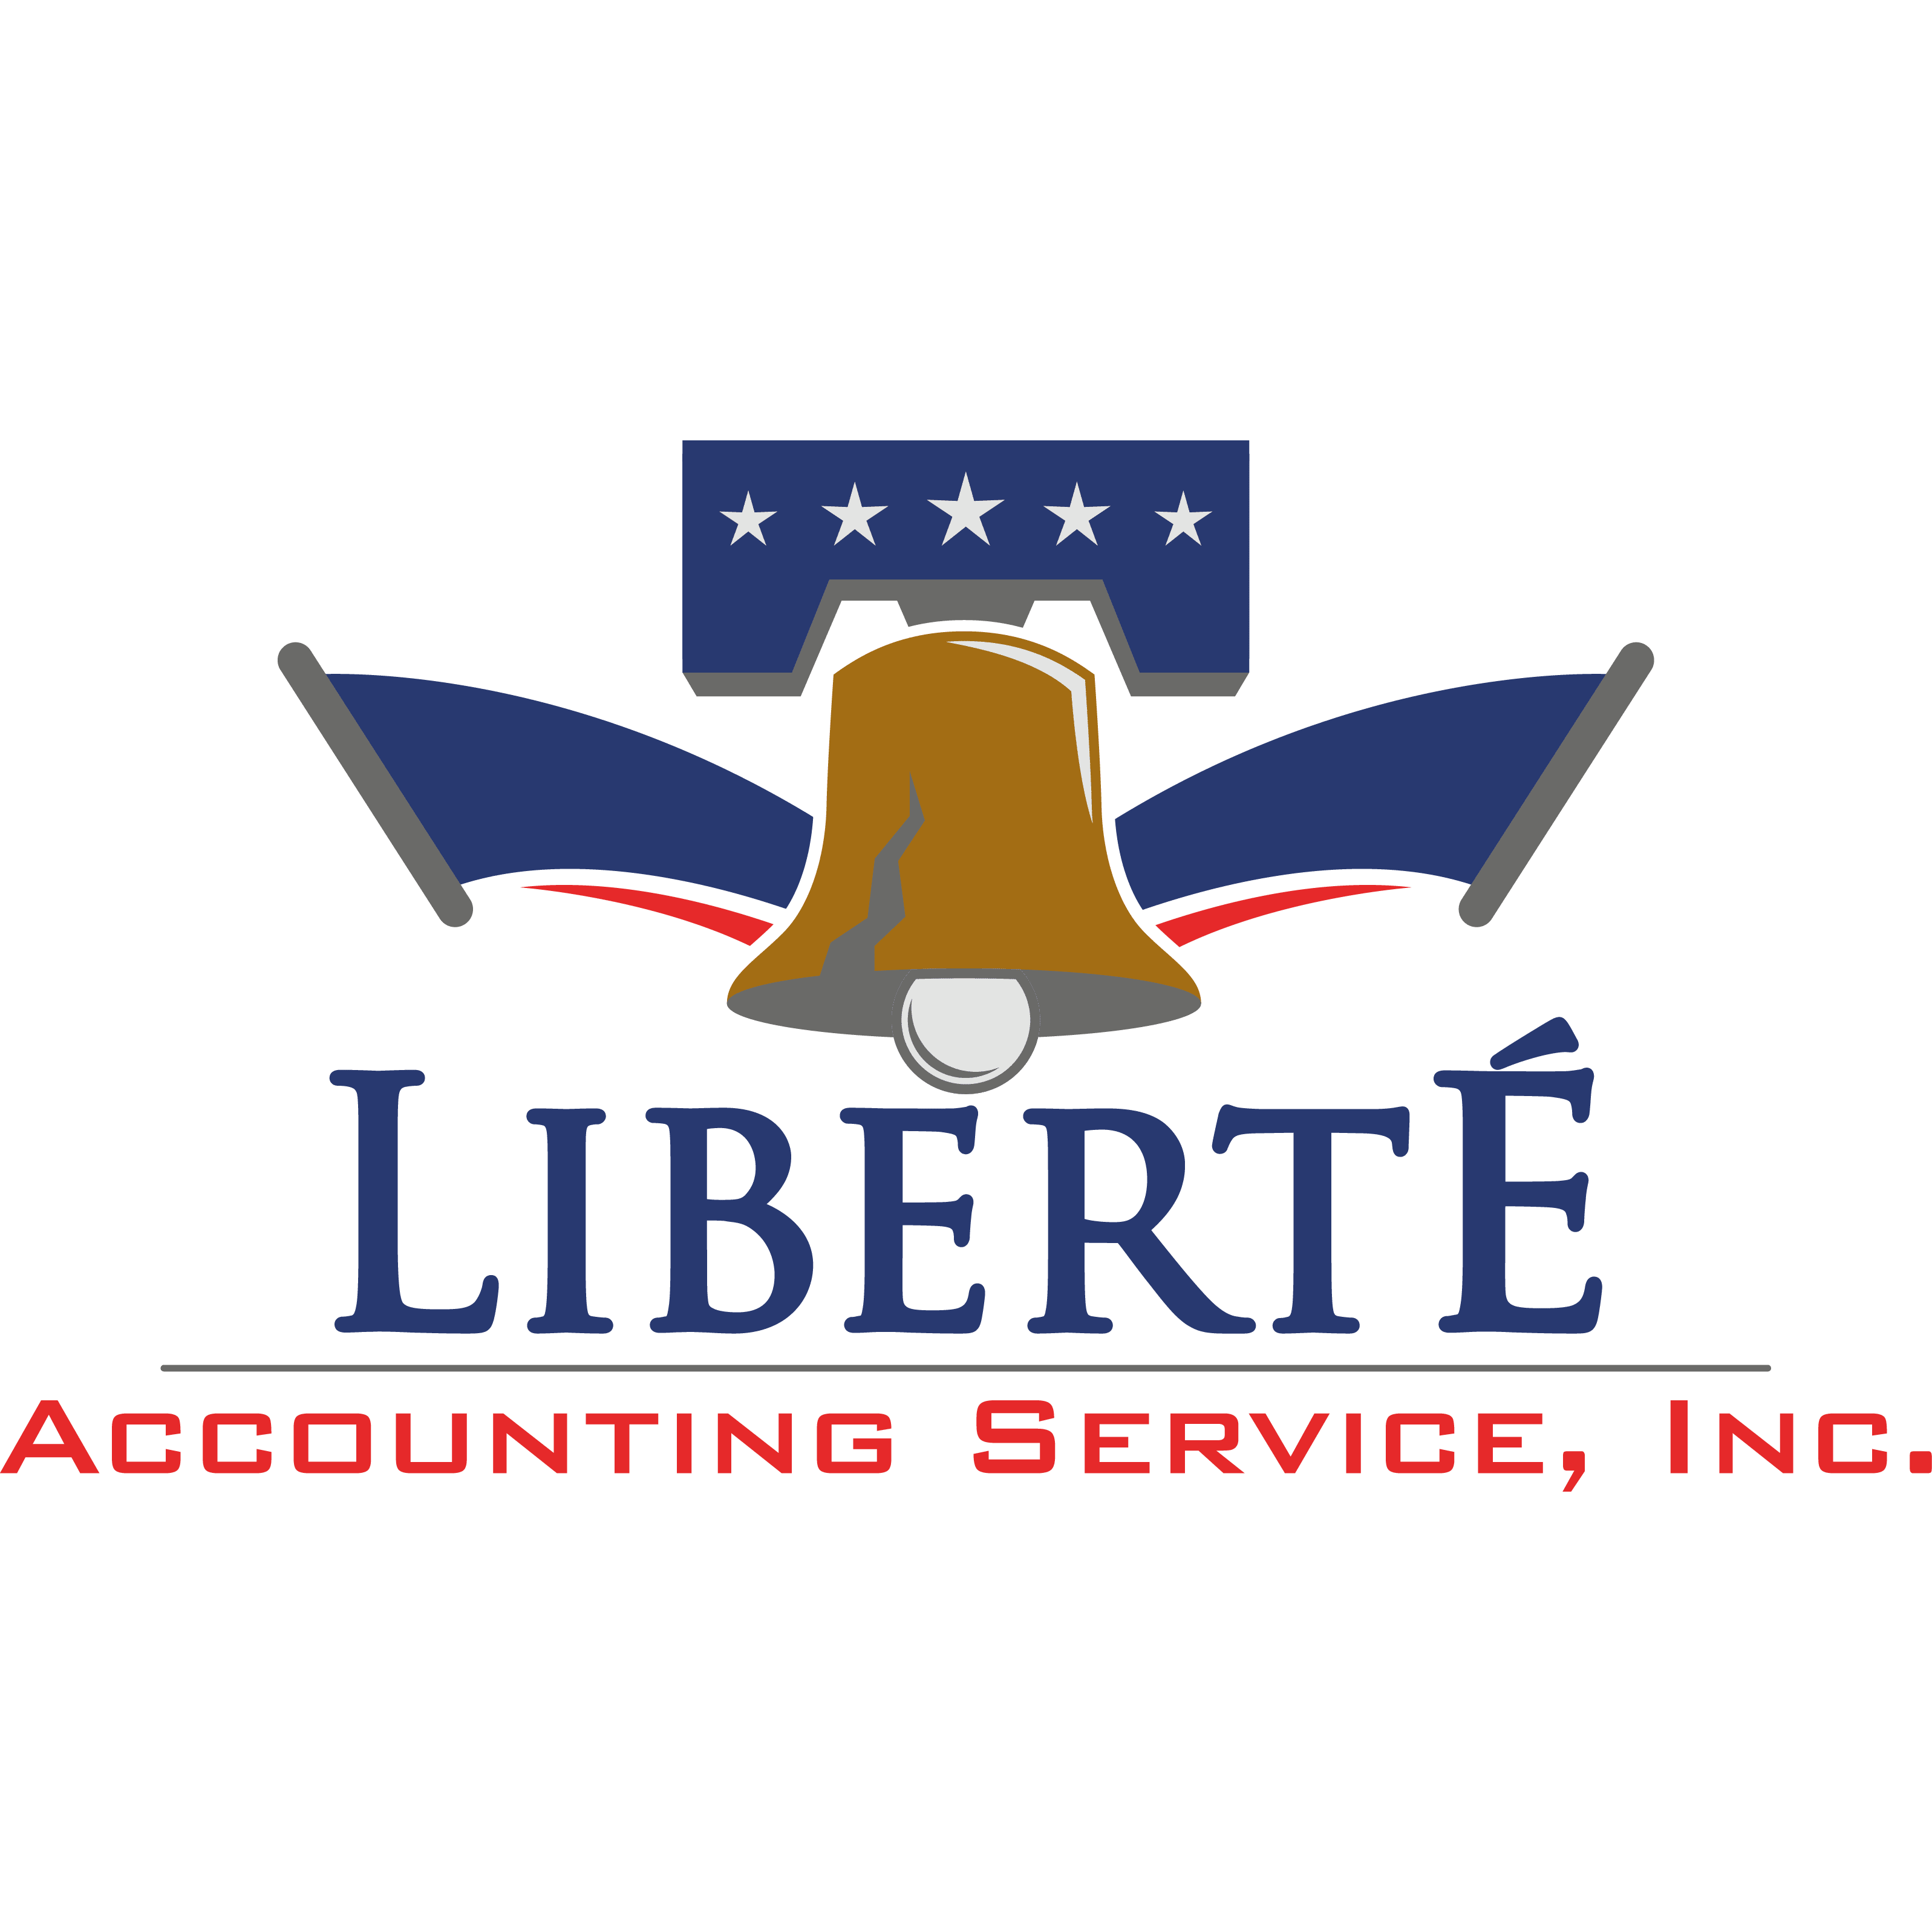 Liberté Accounting Service, Inc.